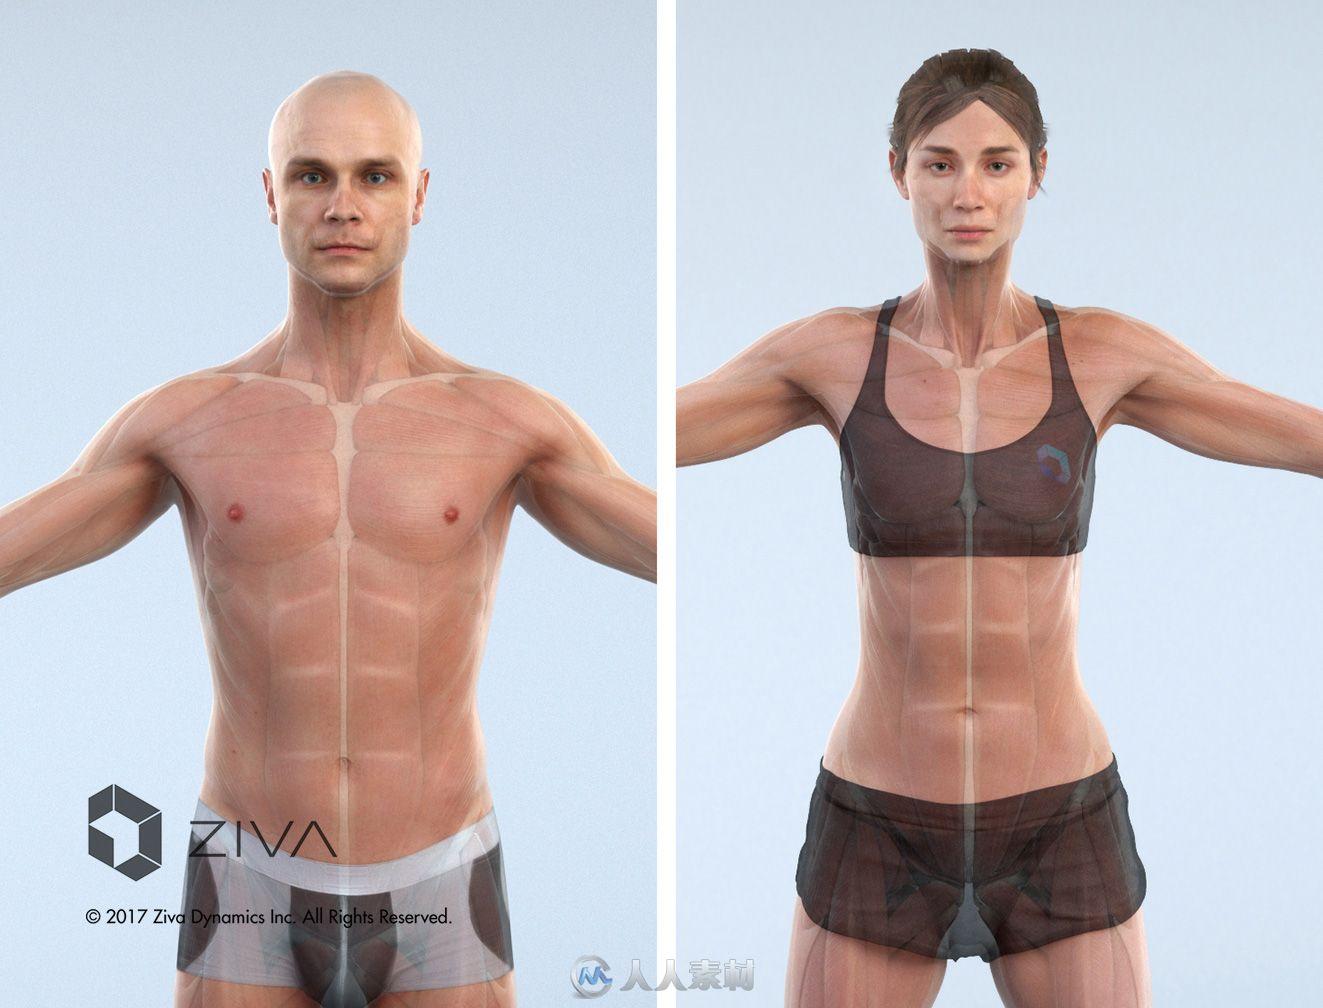 Ziva Dynamics Ziva VFX骨骼肌肉运动模拟Maya插件V1.6版21 / 作者:抱着猫的老鼠 / 帖子ID:16755361,5650261